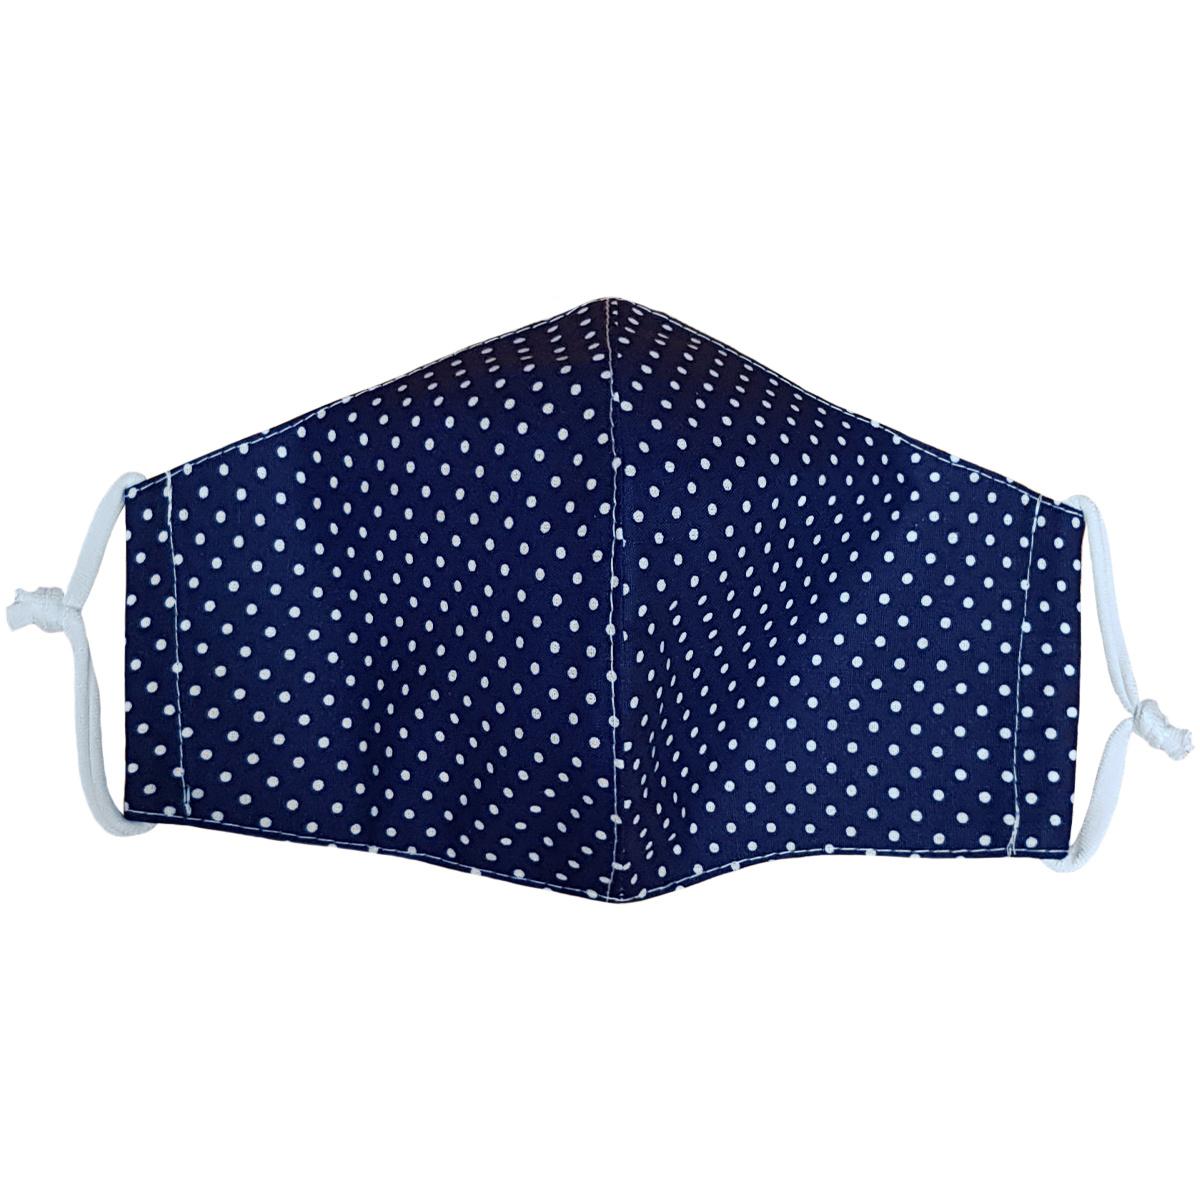 Ústní bavlněná rouška Puntík mini tmavě modrá medium, M